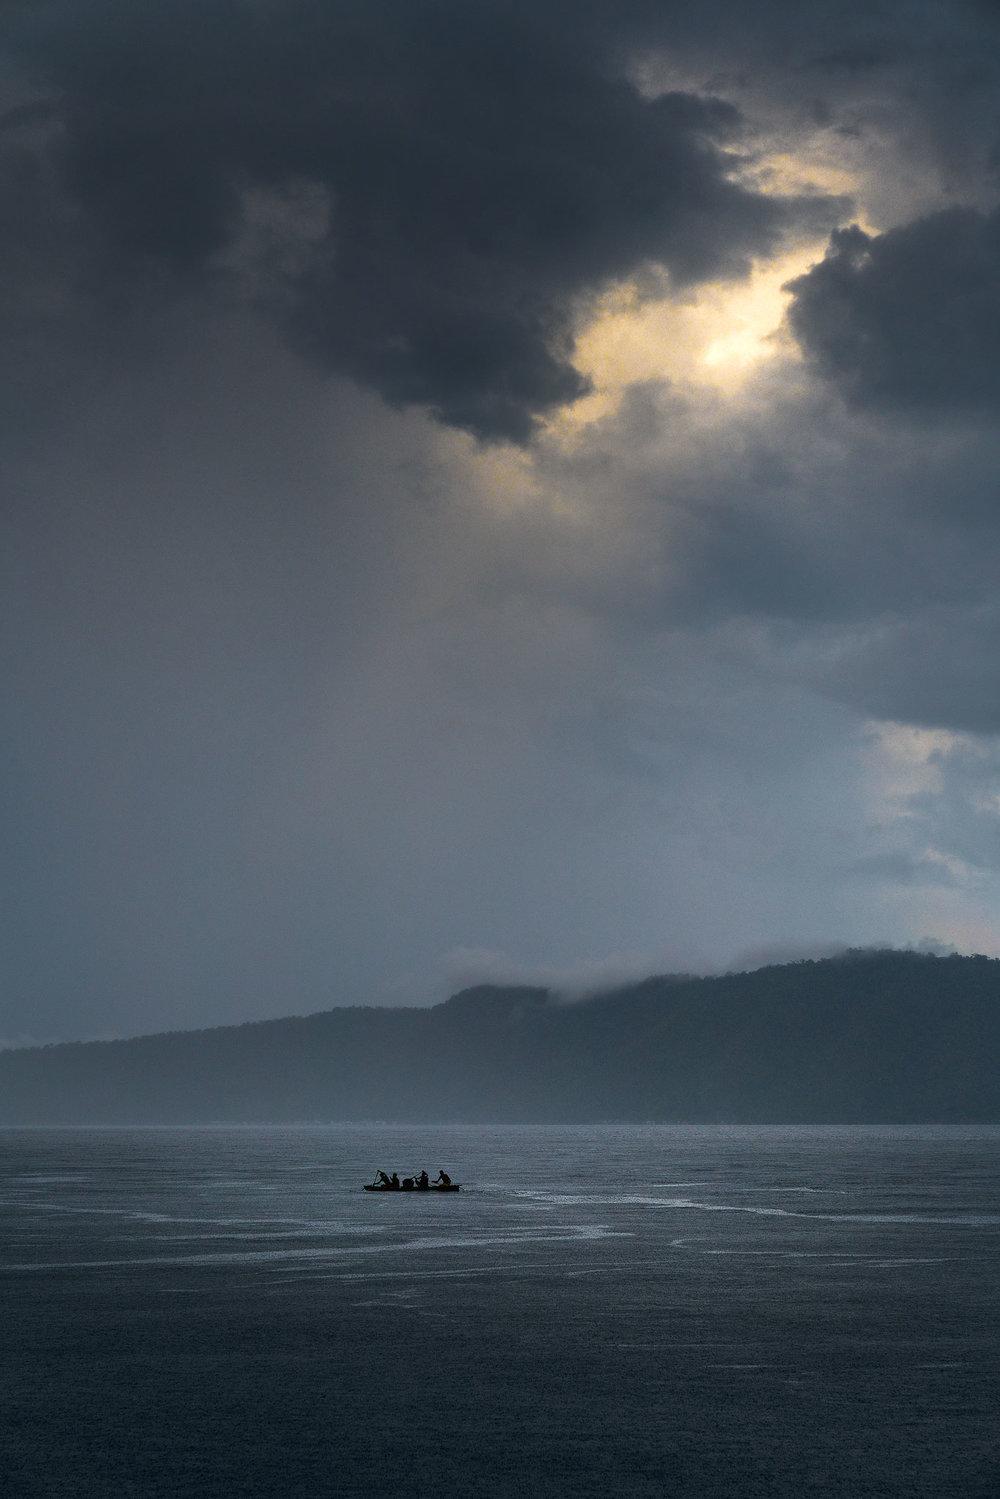 Storm_Boatin_01.jpg